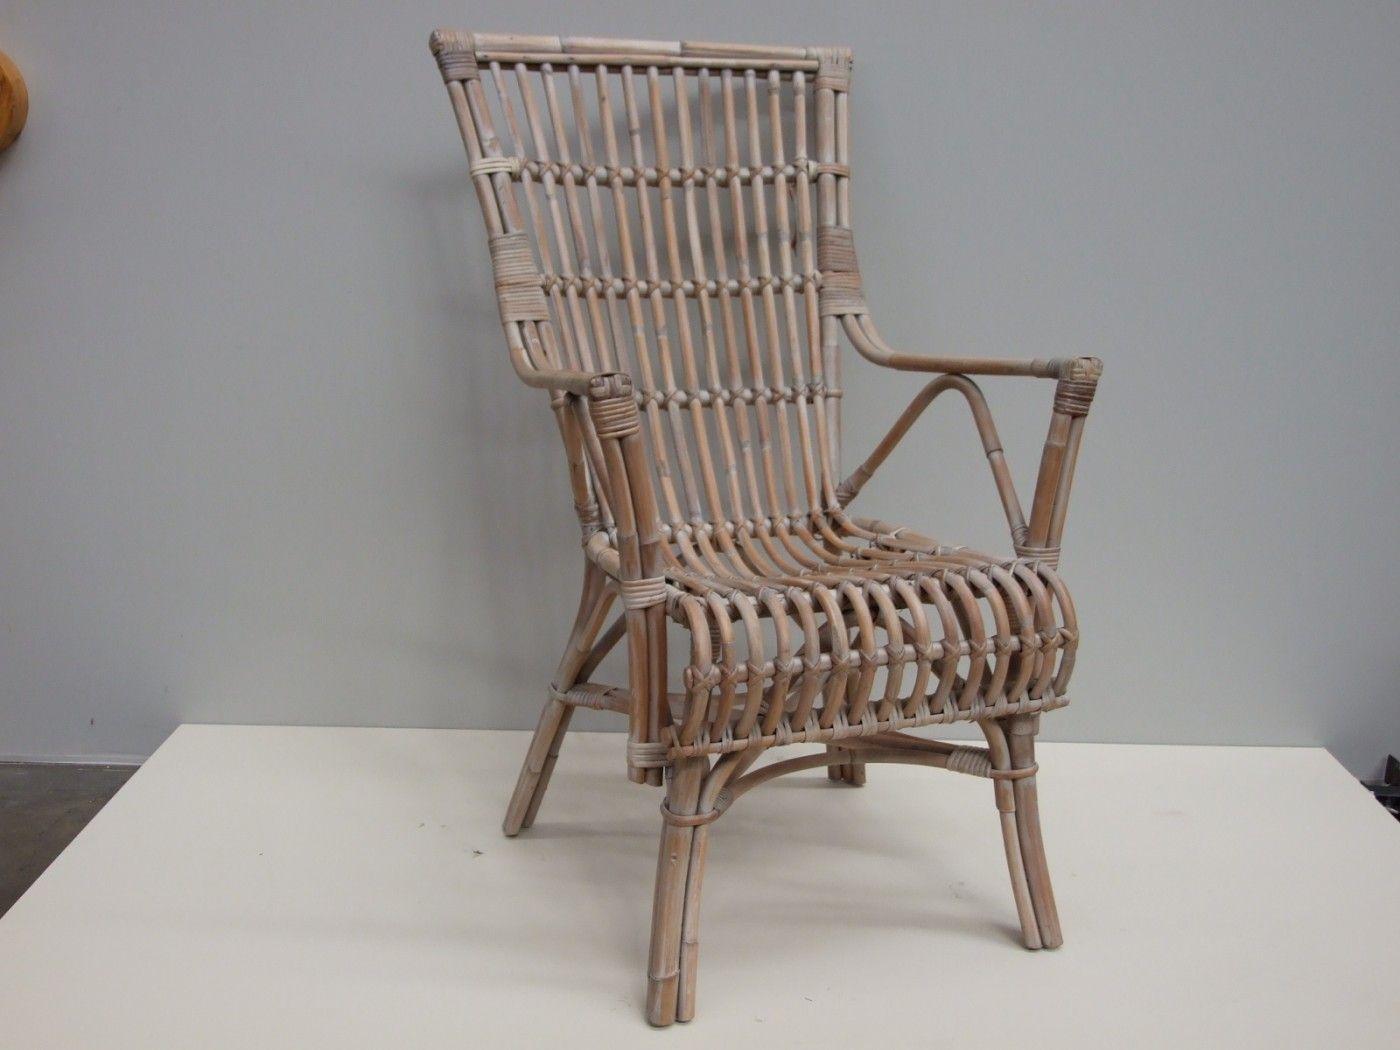 Queenslander Verandah Chair   Outdoor Chairs U0026 Seating   Interiors Online    Furniture Online U0026 Decorating